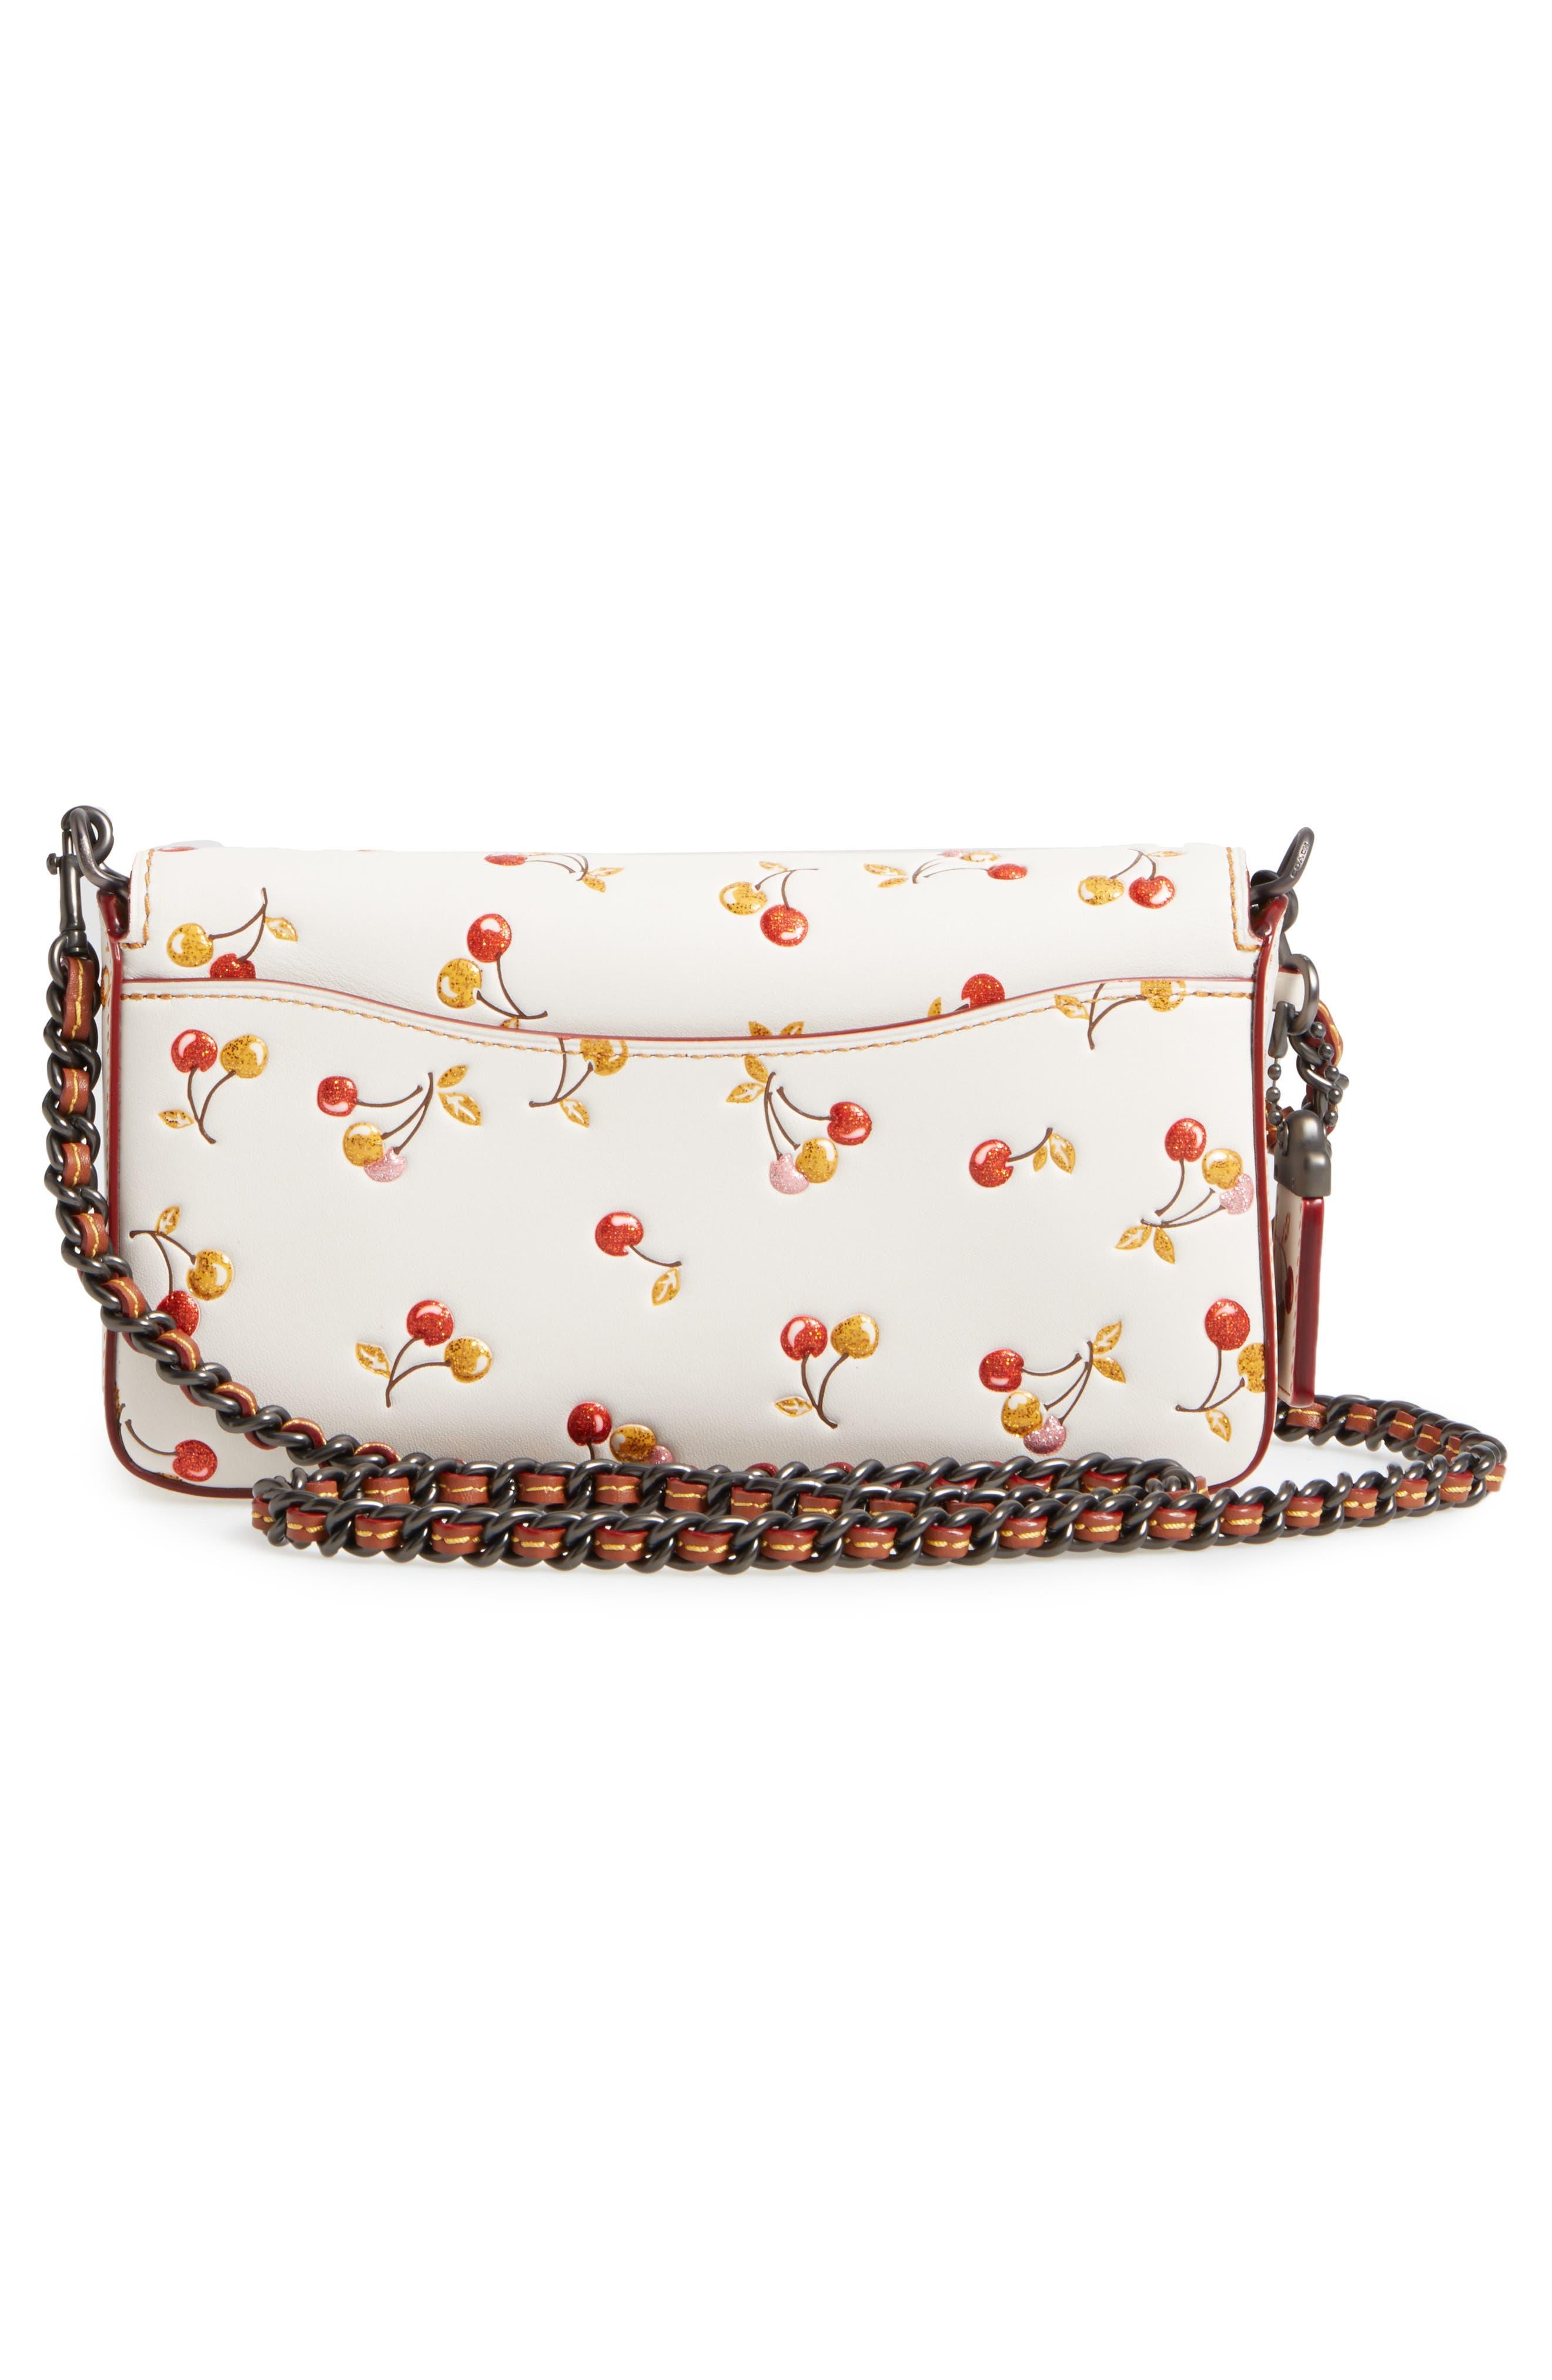 Cherries Dinky Leather Crossbody Bag,                             Alternate thumbnail 3, color,                             250